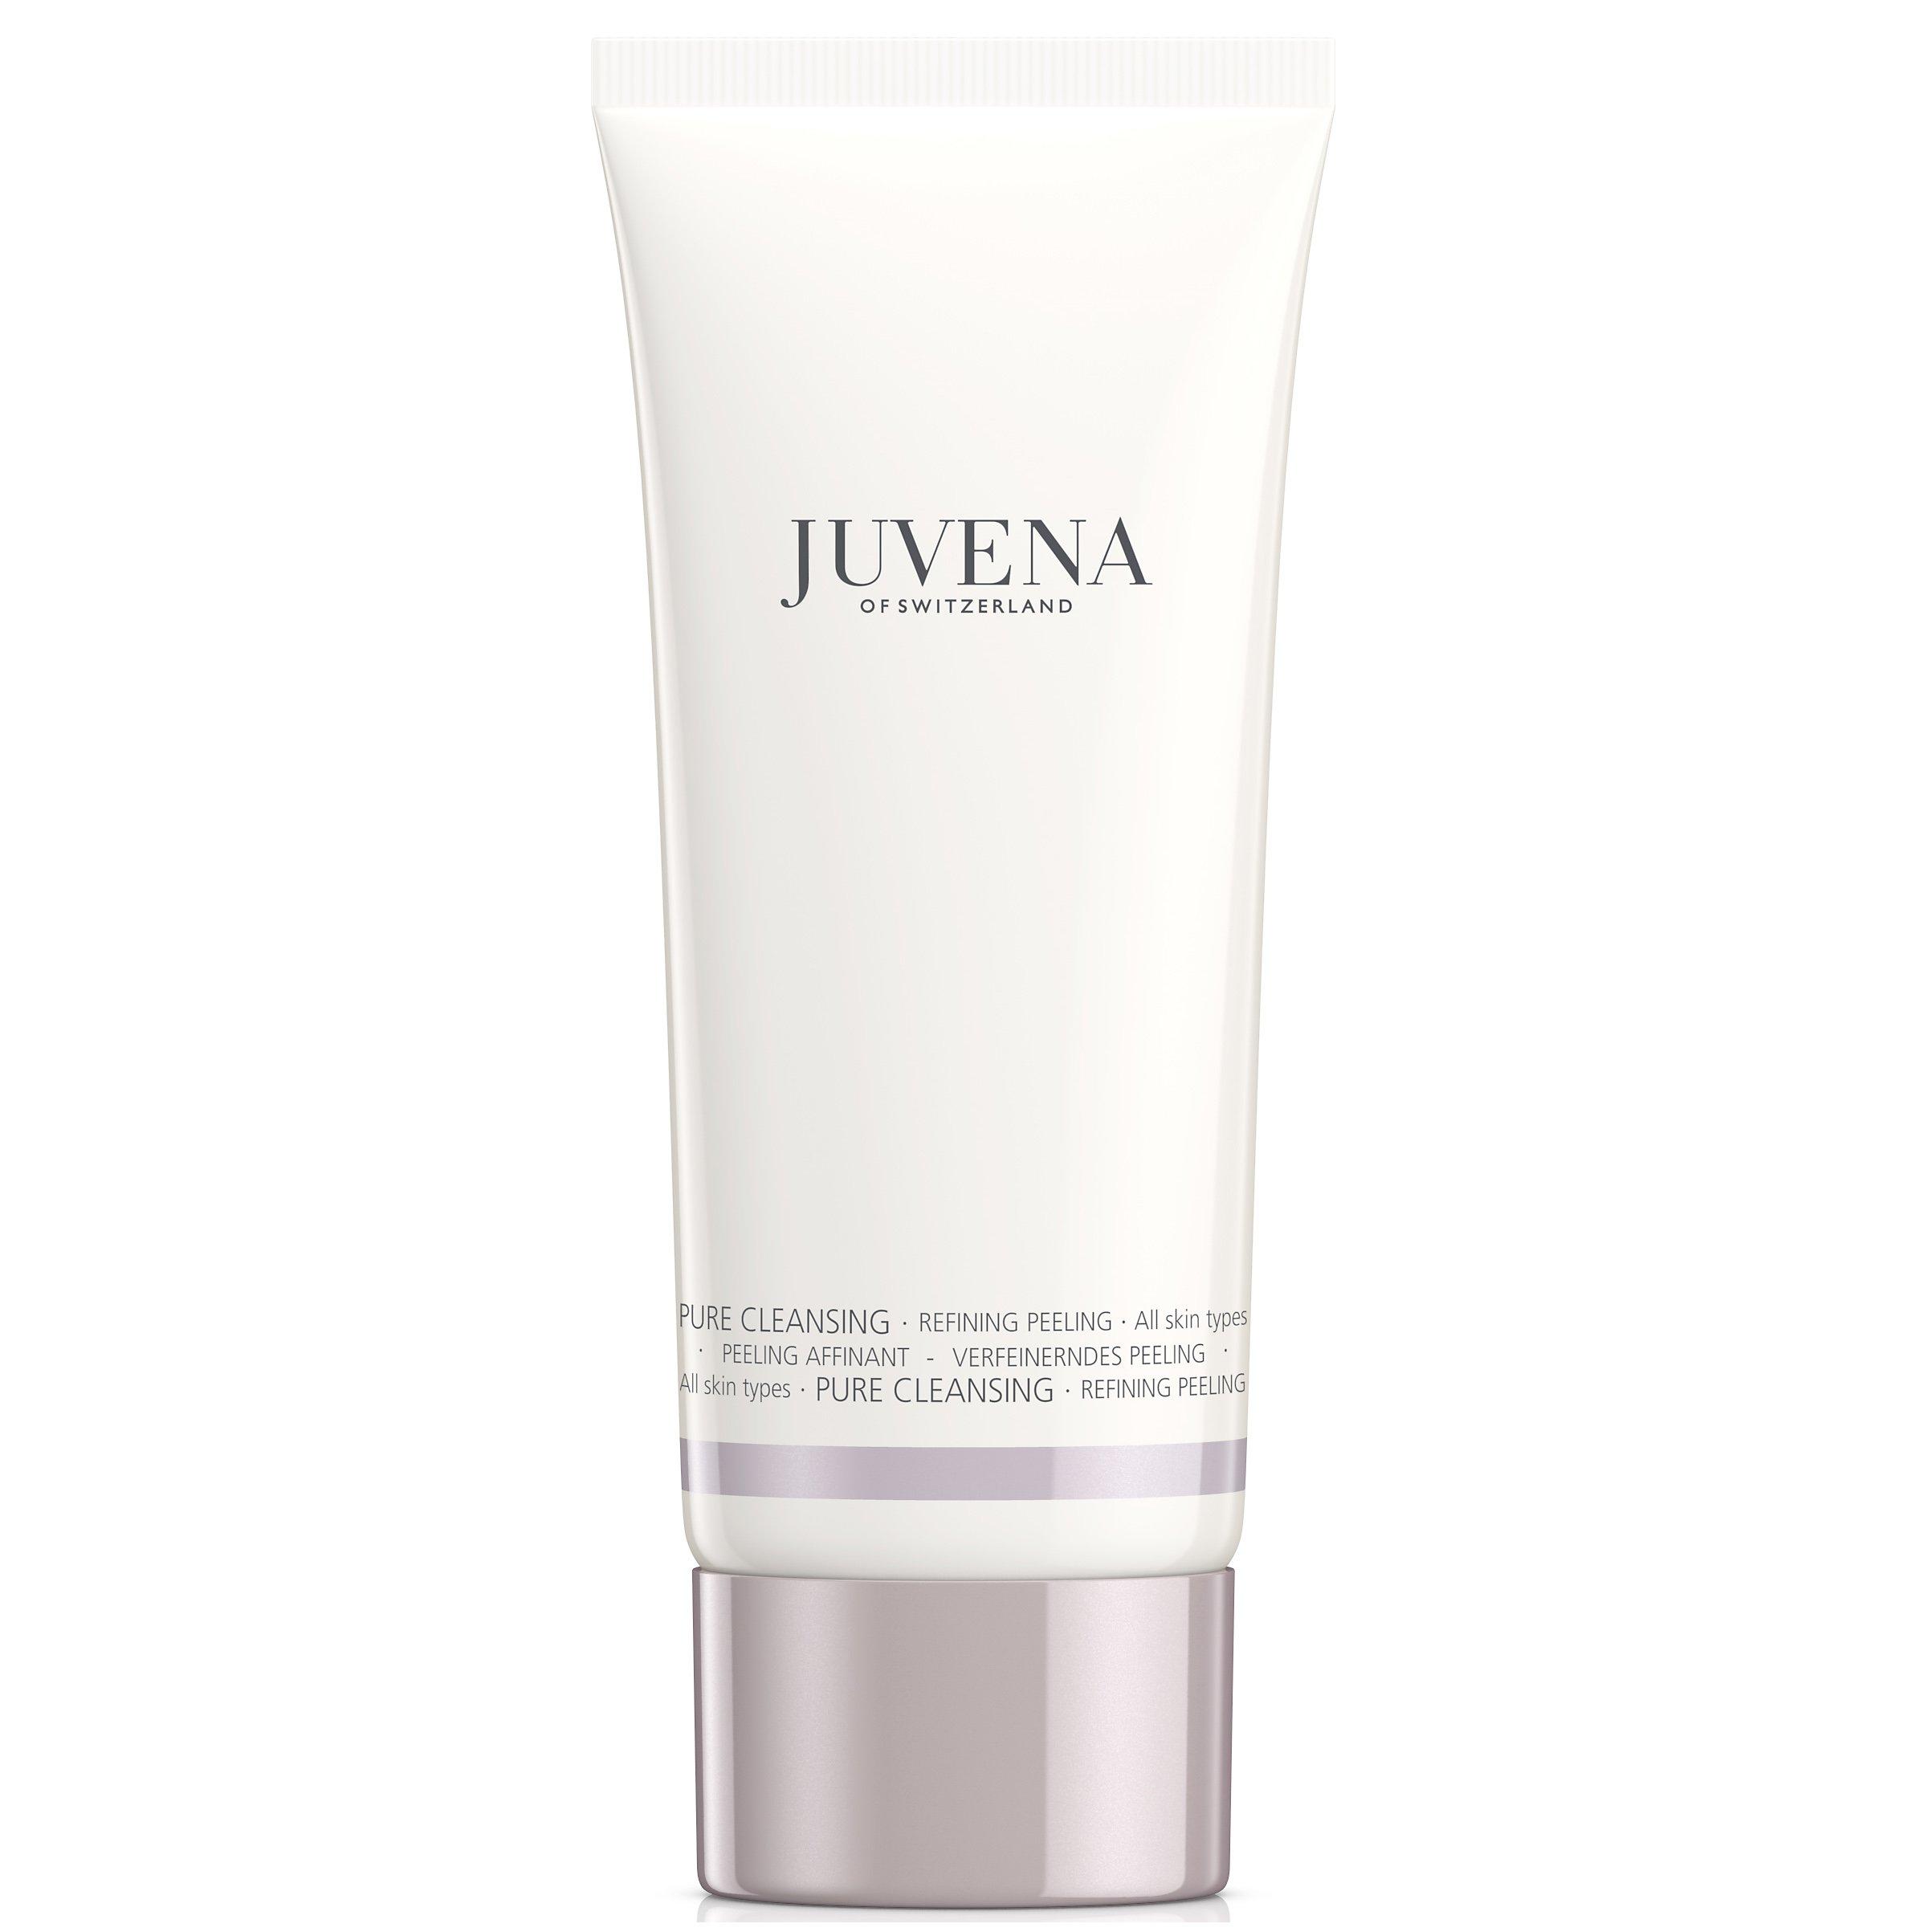 Juvena Pure Cleansing Refining Peeling Κρέμα Απολέπισης Προσώπου για Ομοιόμορφο & Λαμπερό Δέρμα, Όλοι οι Τύποι 100ml